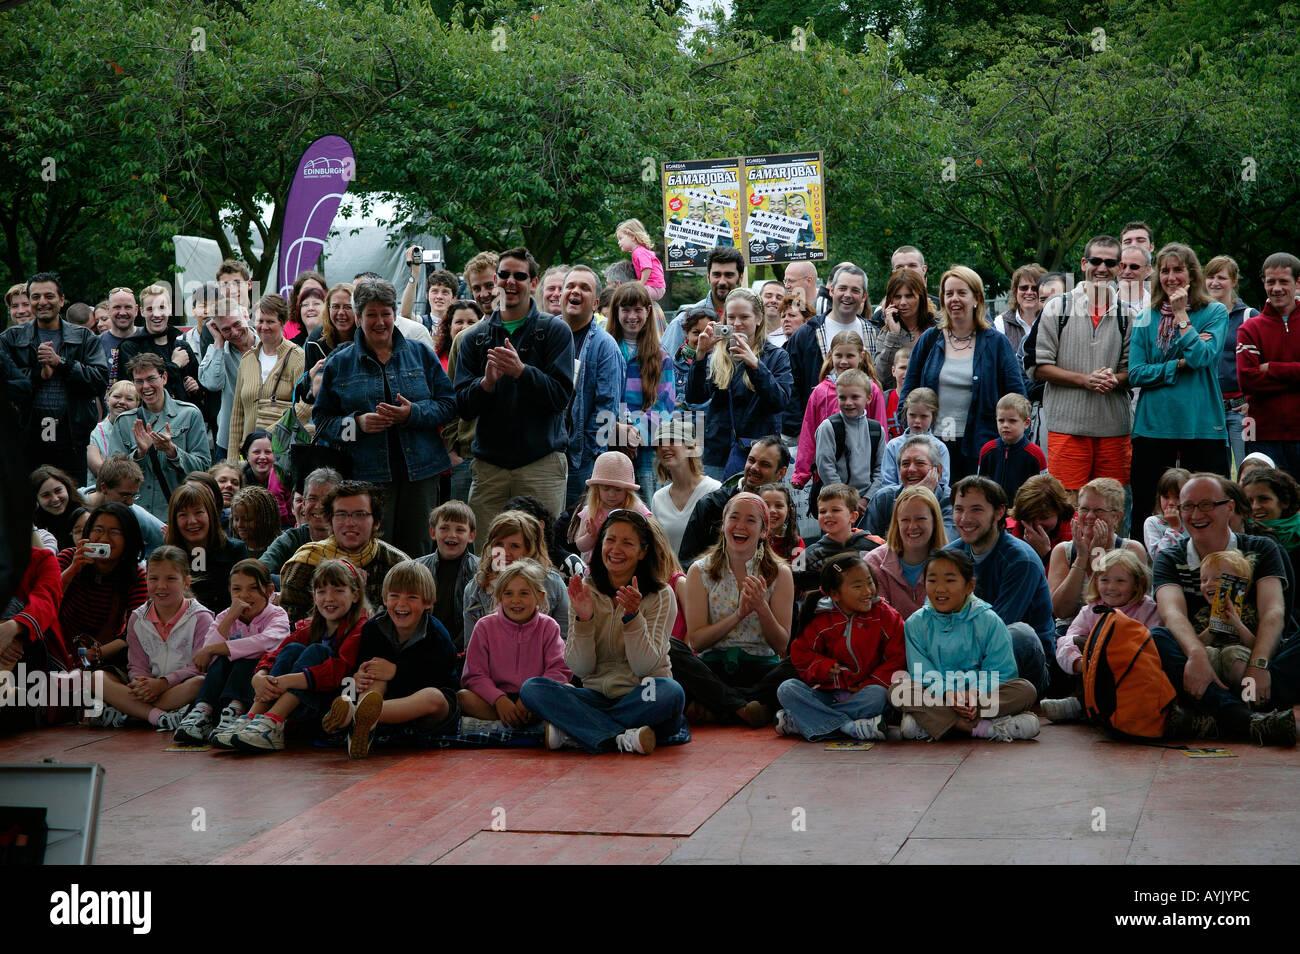 Edinburgh Fringe Festival audience, Scotland - Stock Image